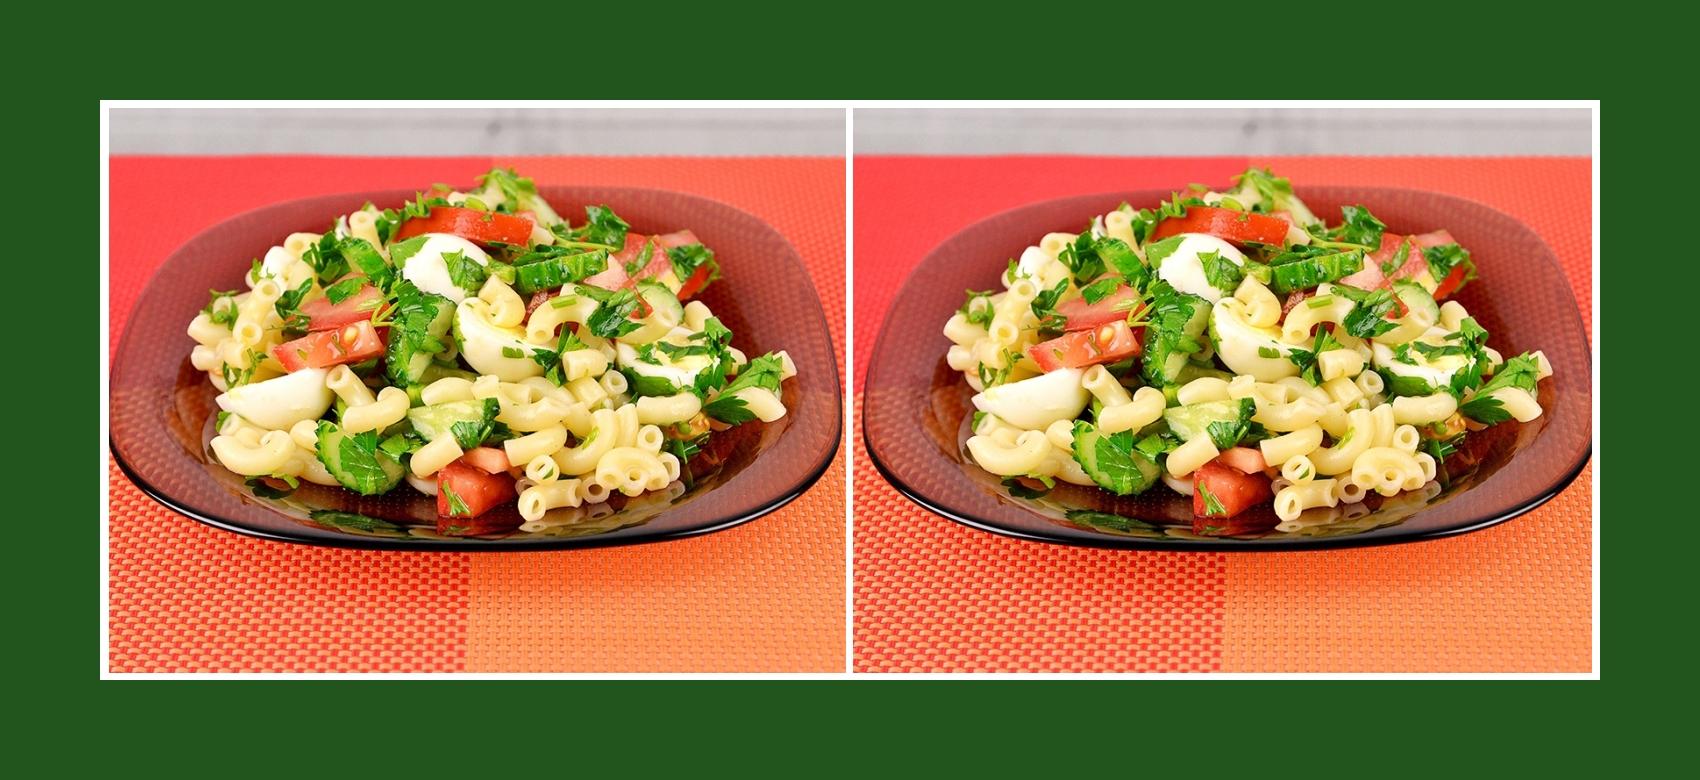 Gesunder Nudelsalat Gemüsesalat mit Wachteleiern